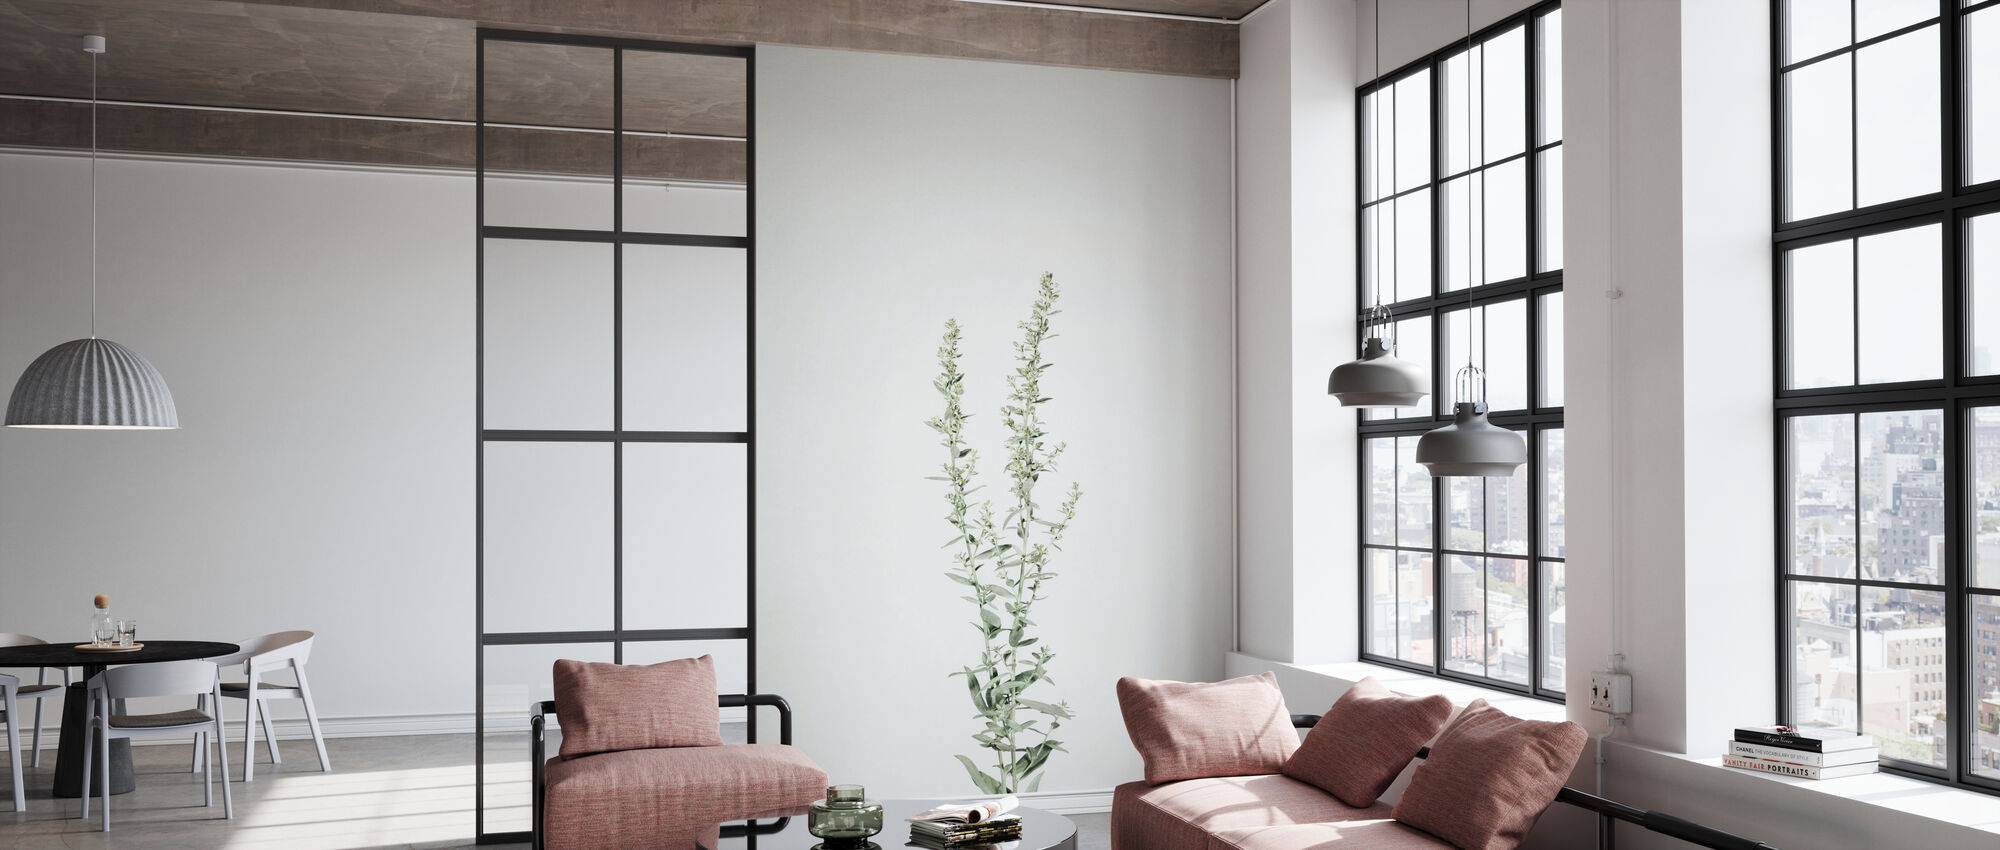 Simple Stems IV - Wallpaper - Office